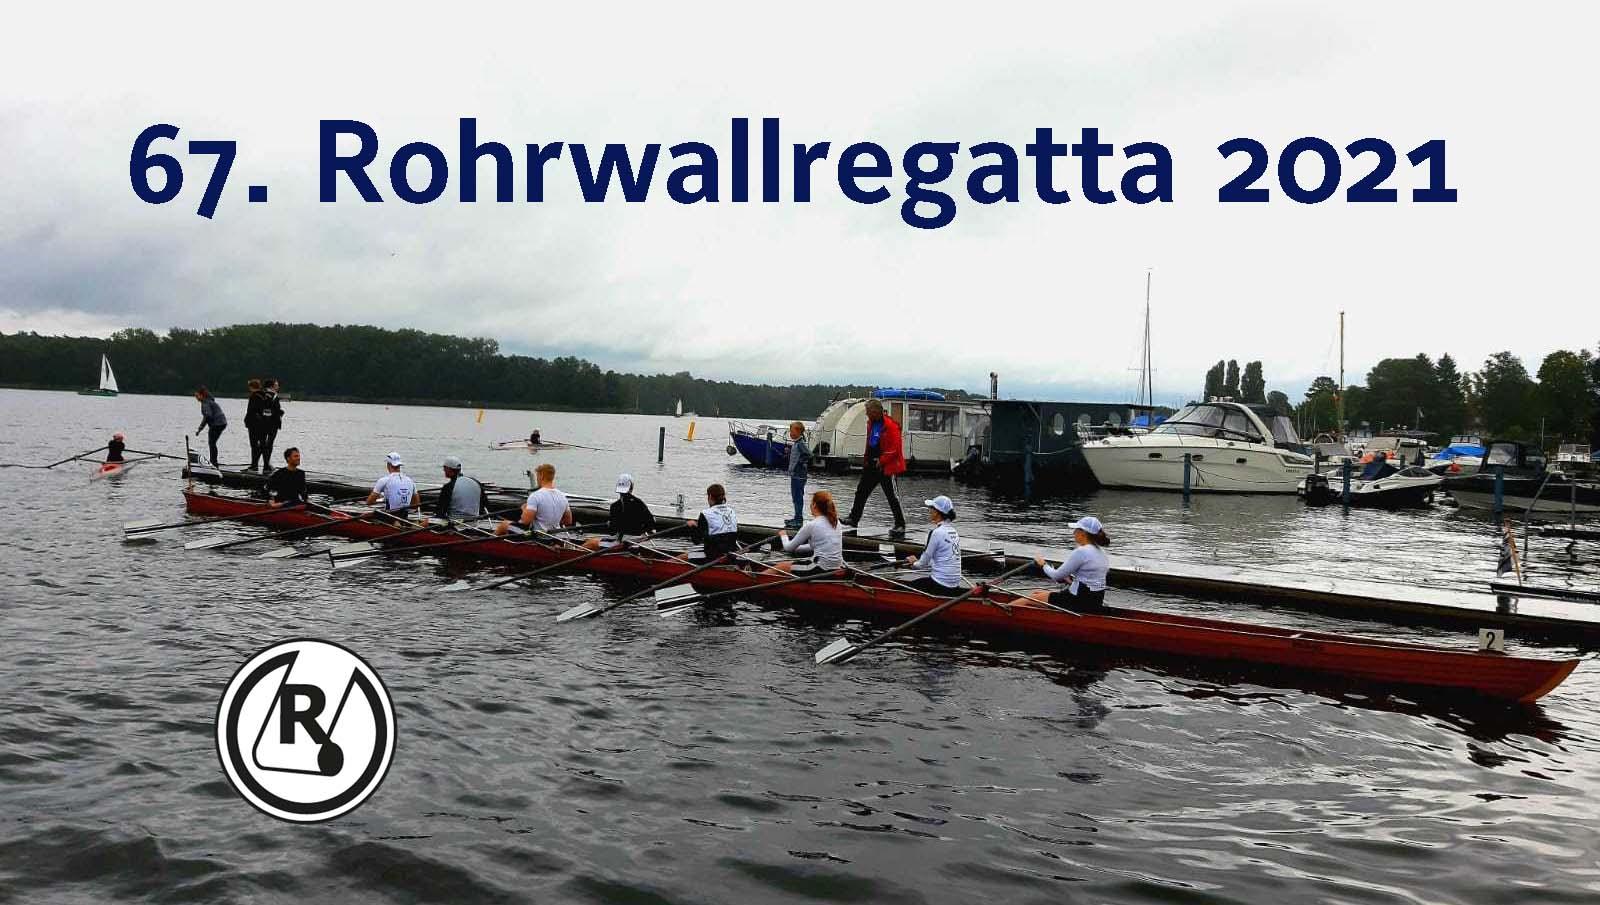 18.09.2021 – Die 67. Regatta am Rohrwall 2021